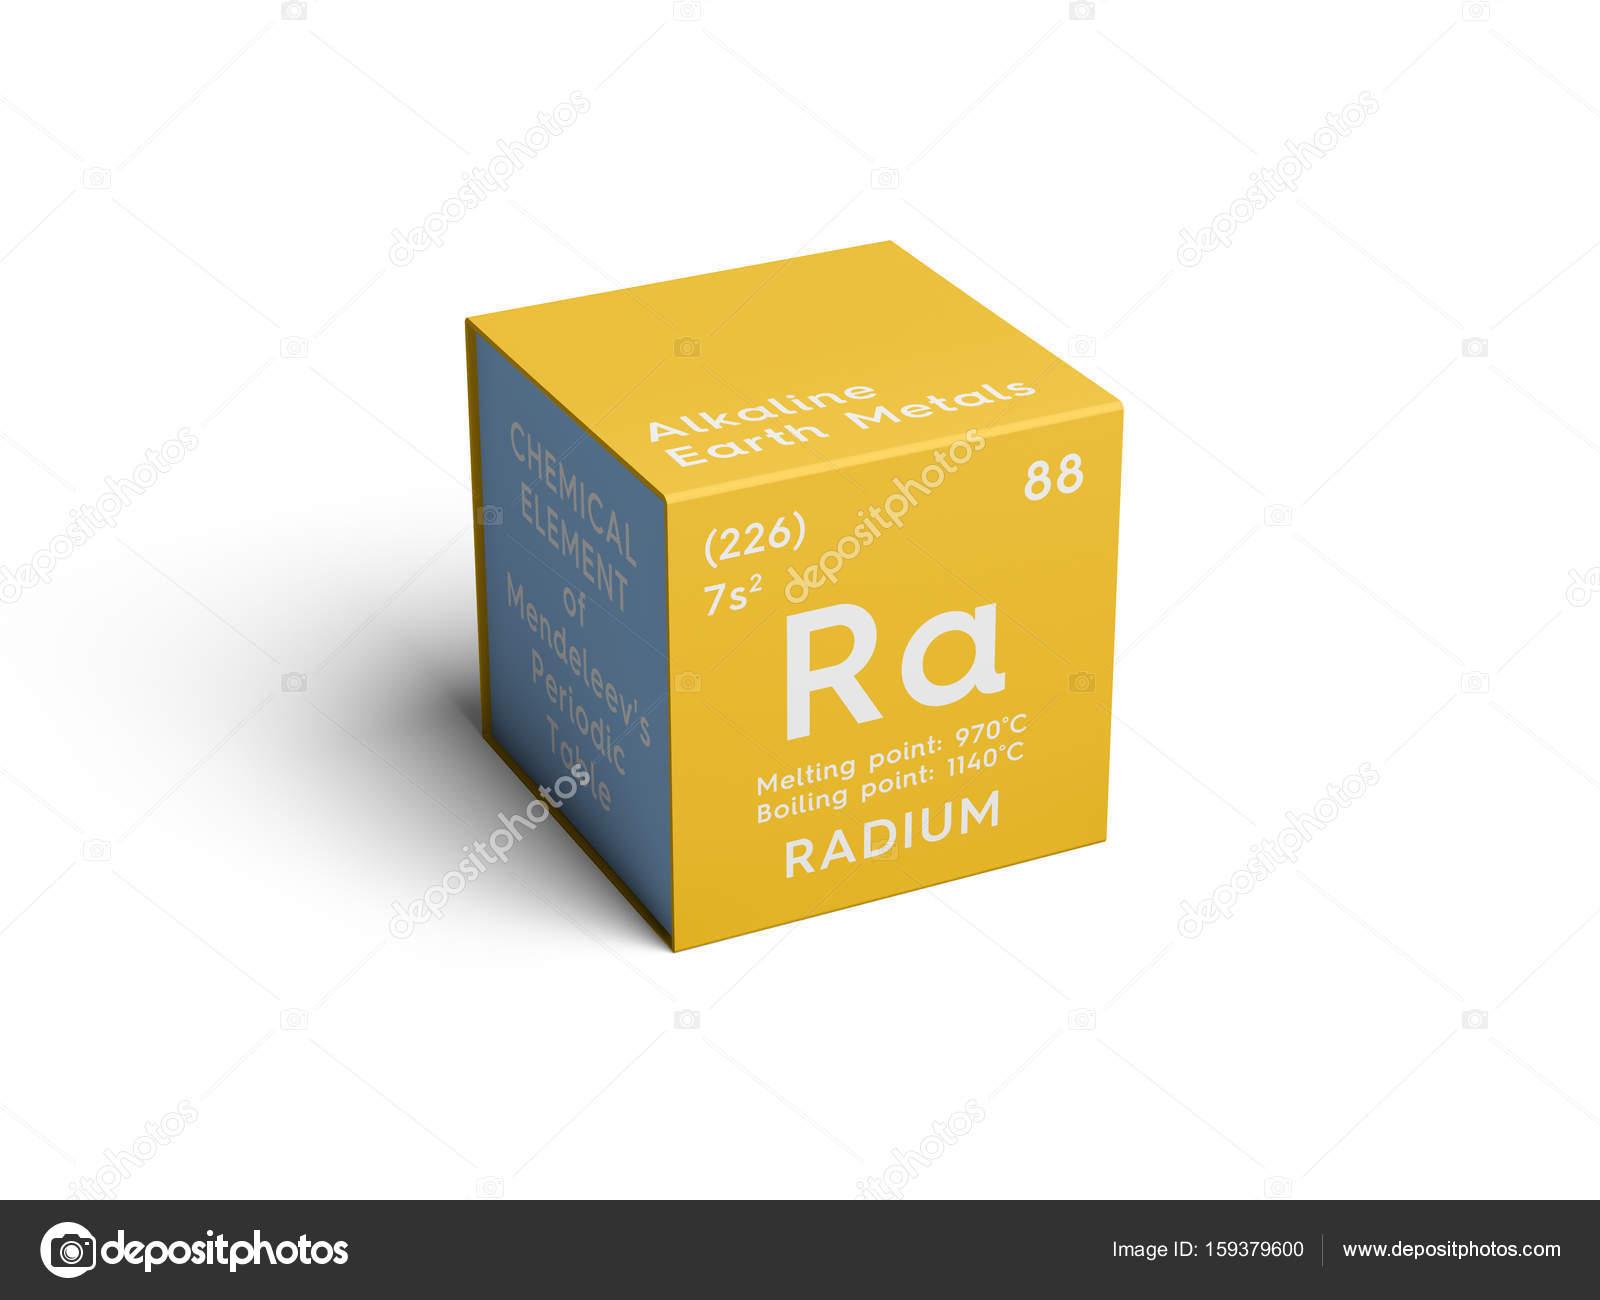 Radium alkaline earth metals chemical element of mendeleevs alkaline earth metals chemical element of mendeleevs periodic table stock photo urtaz Choice Image